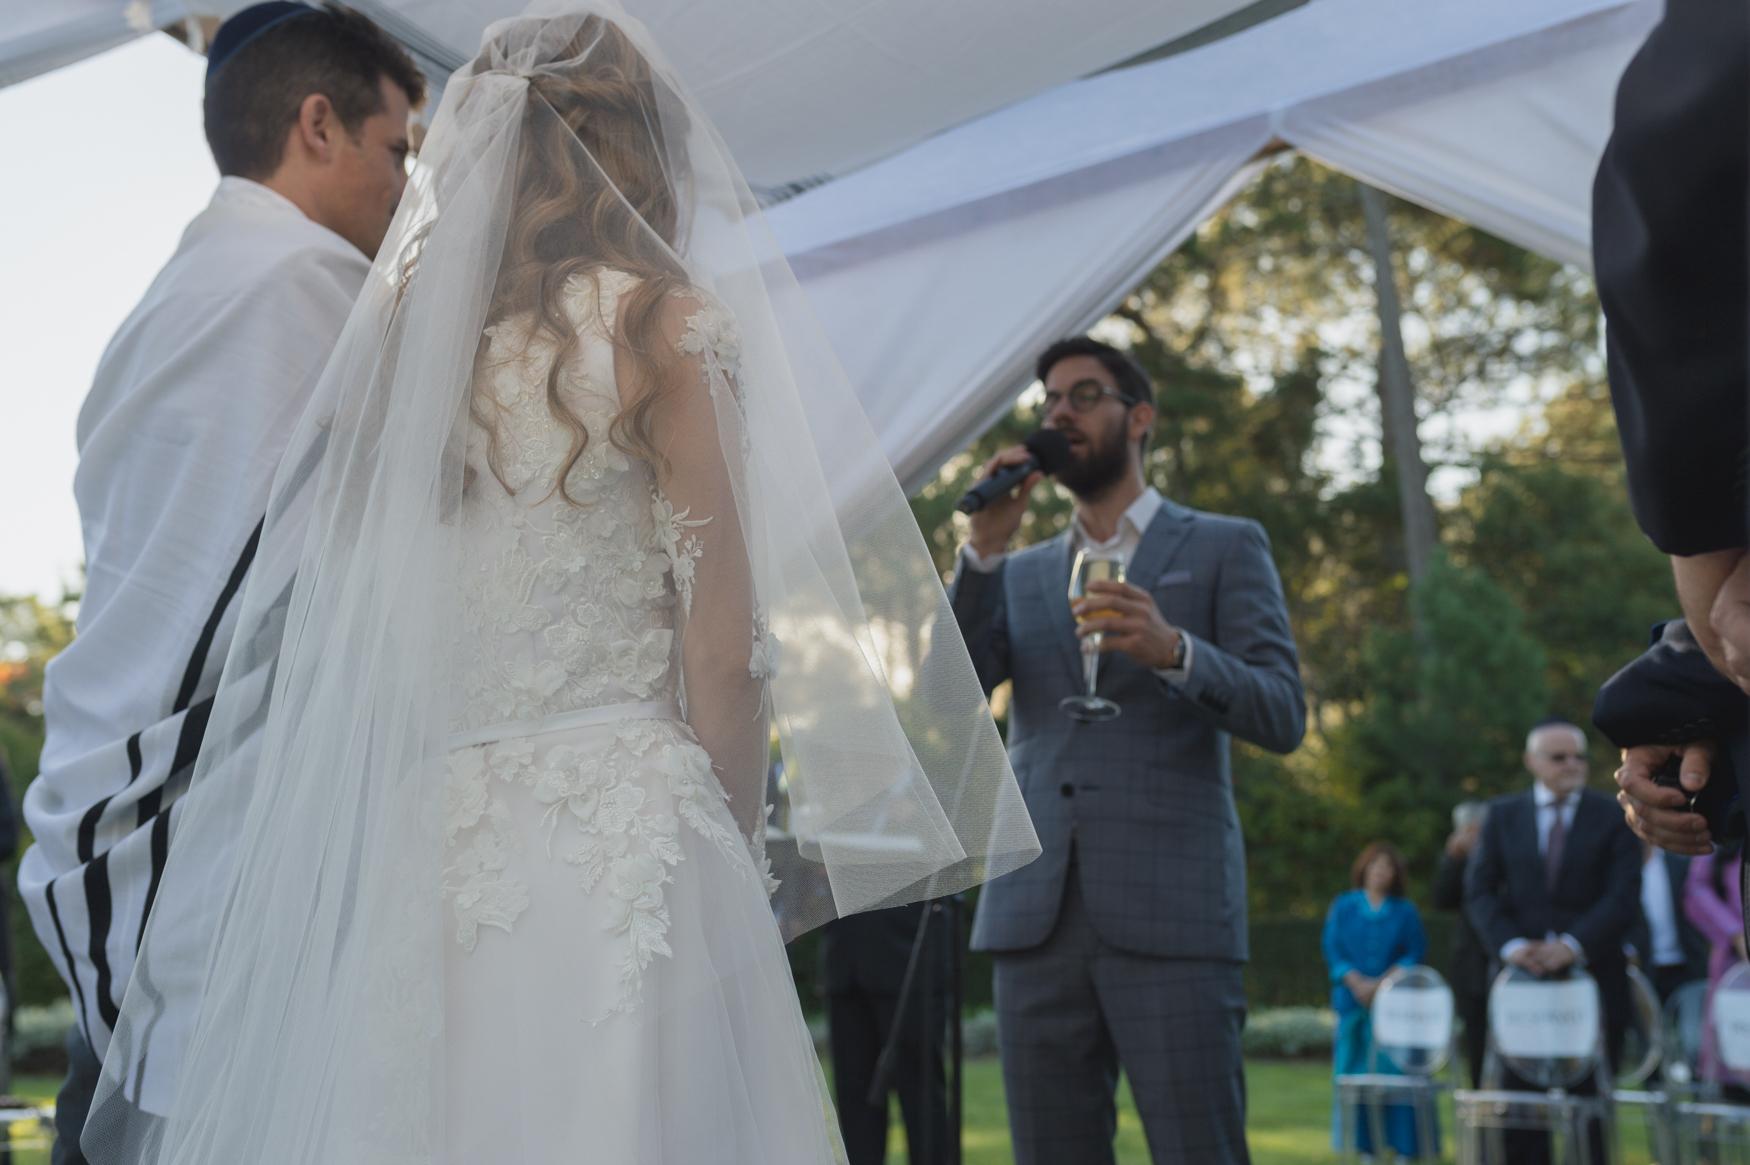 Leon_&_Martine's_Wedding_Photographs_17th_April_2019_@johnhenryweddingphoto_Low_Resolution_Web-323.JPG